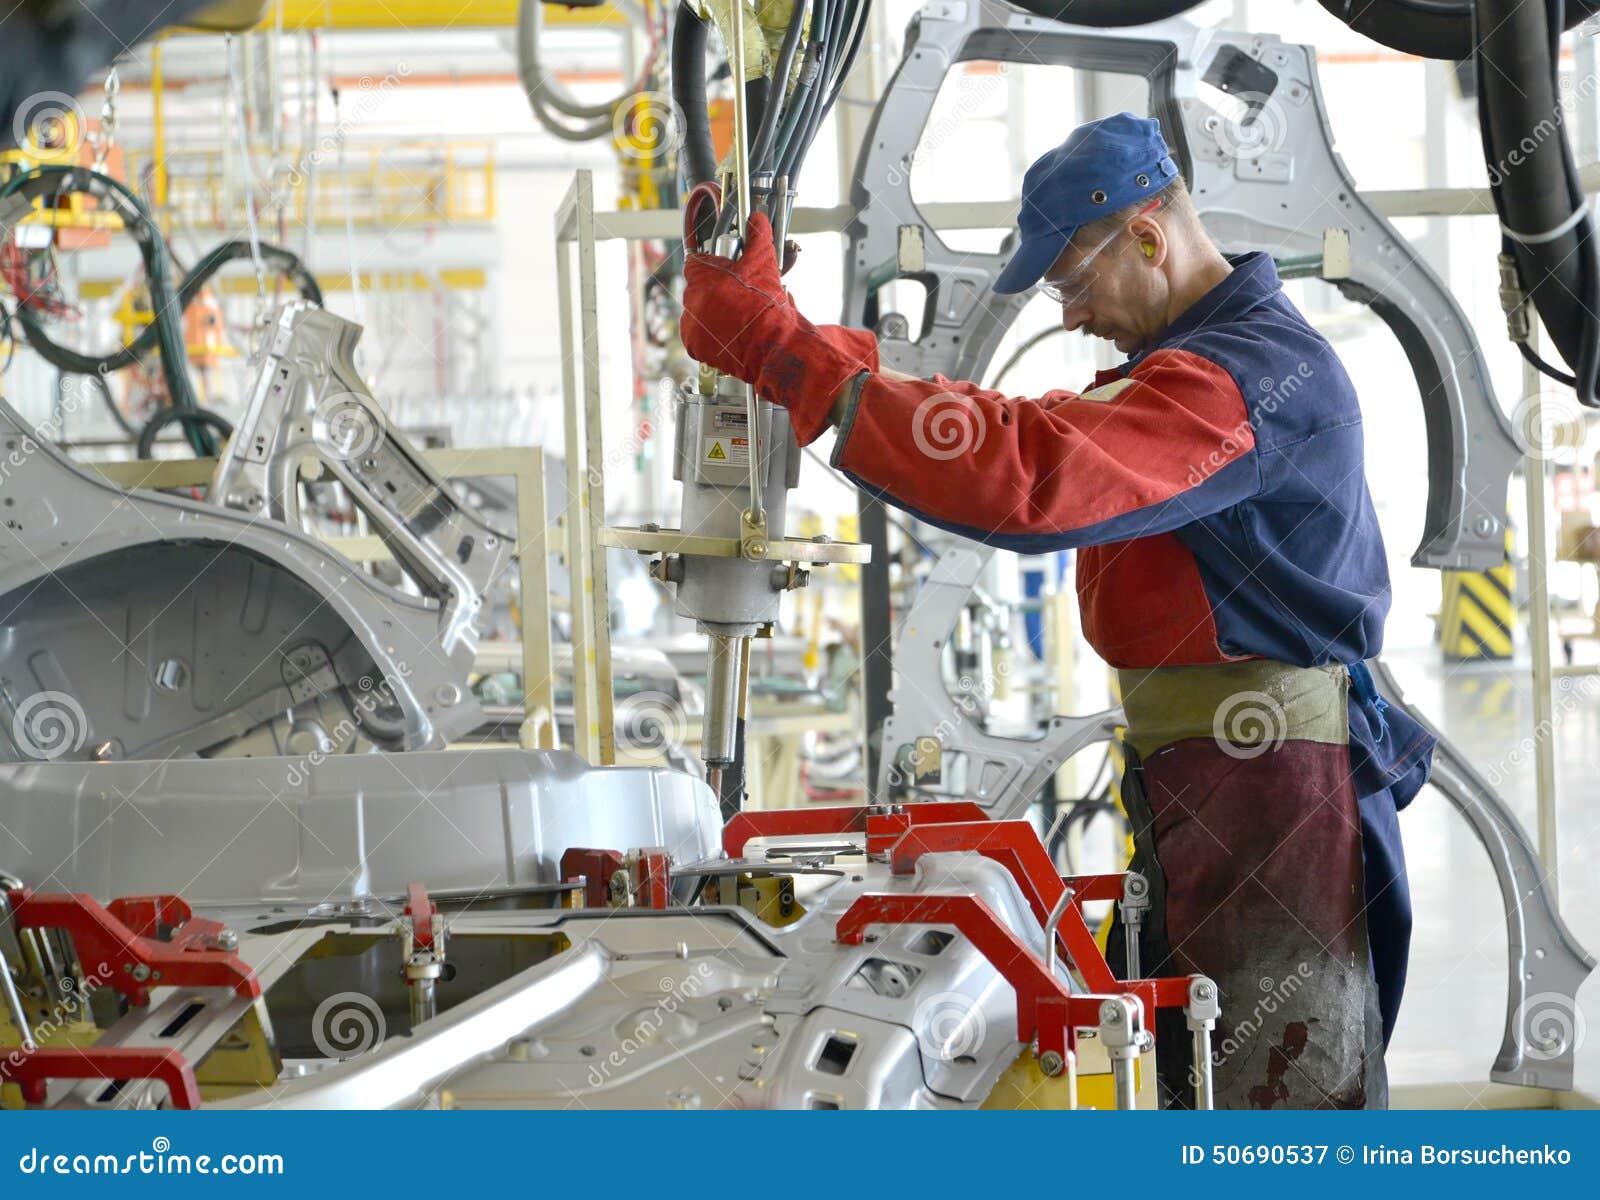 Download 焊工与斑点一起使用设备与焊接联系 Automo 图库摄影片. 图片 包括有 企业, 焊工, 斯拉夫语, 自动性 - 50690537